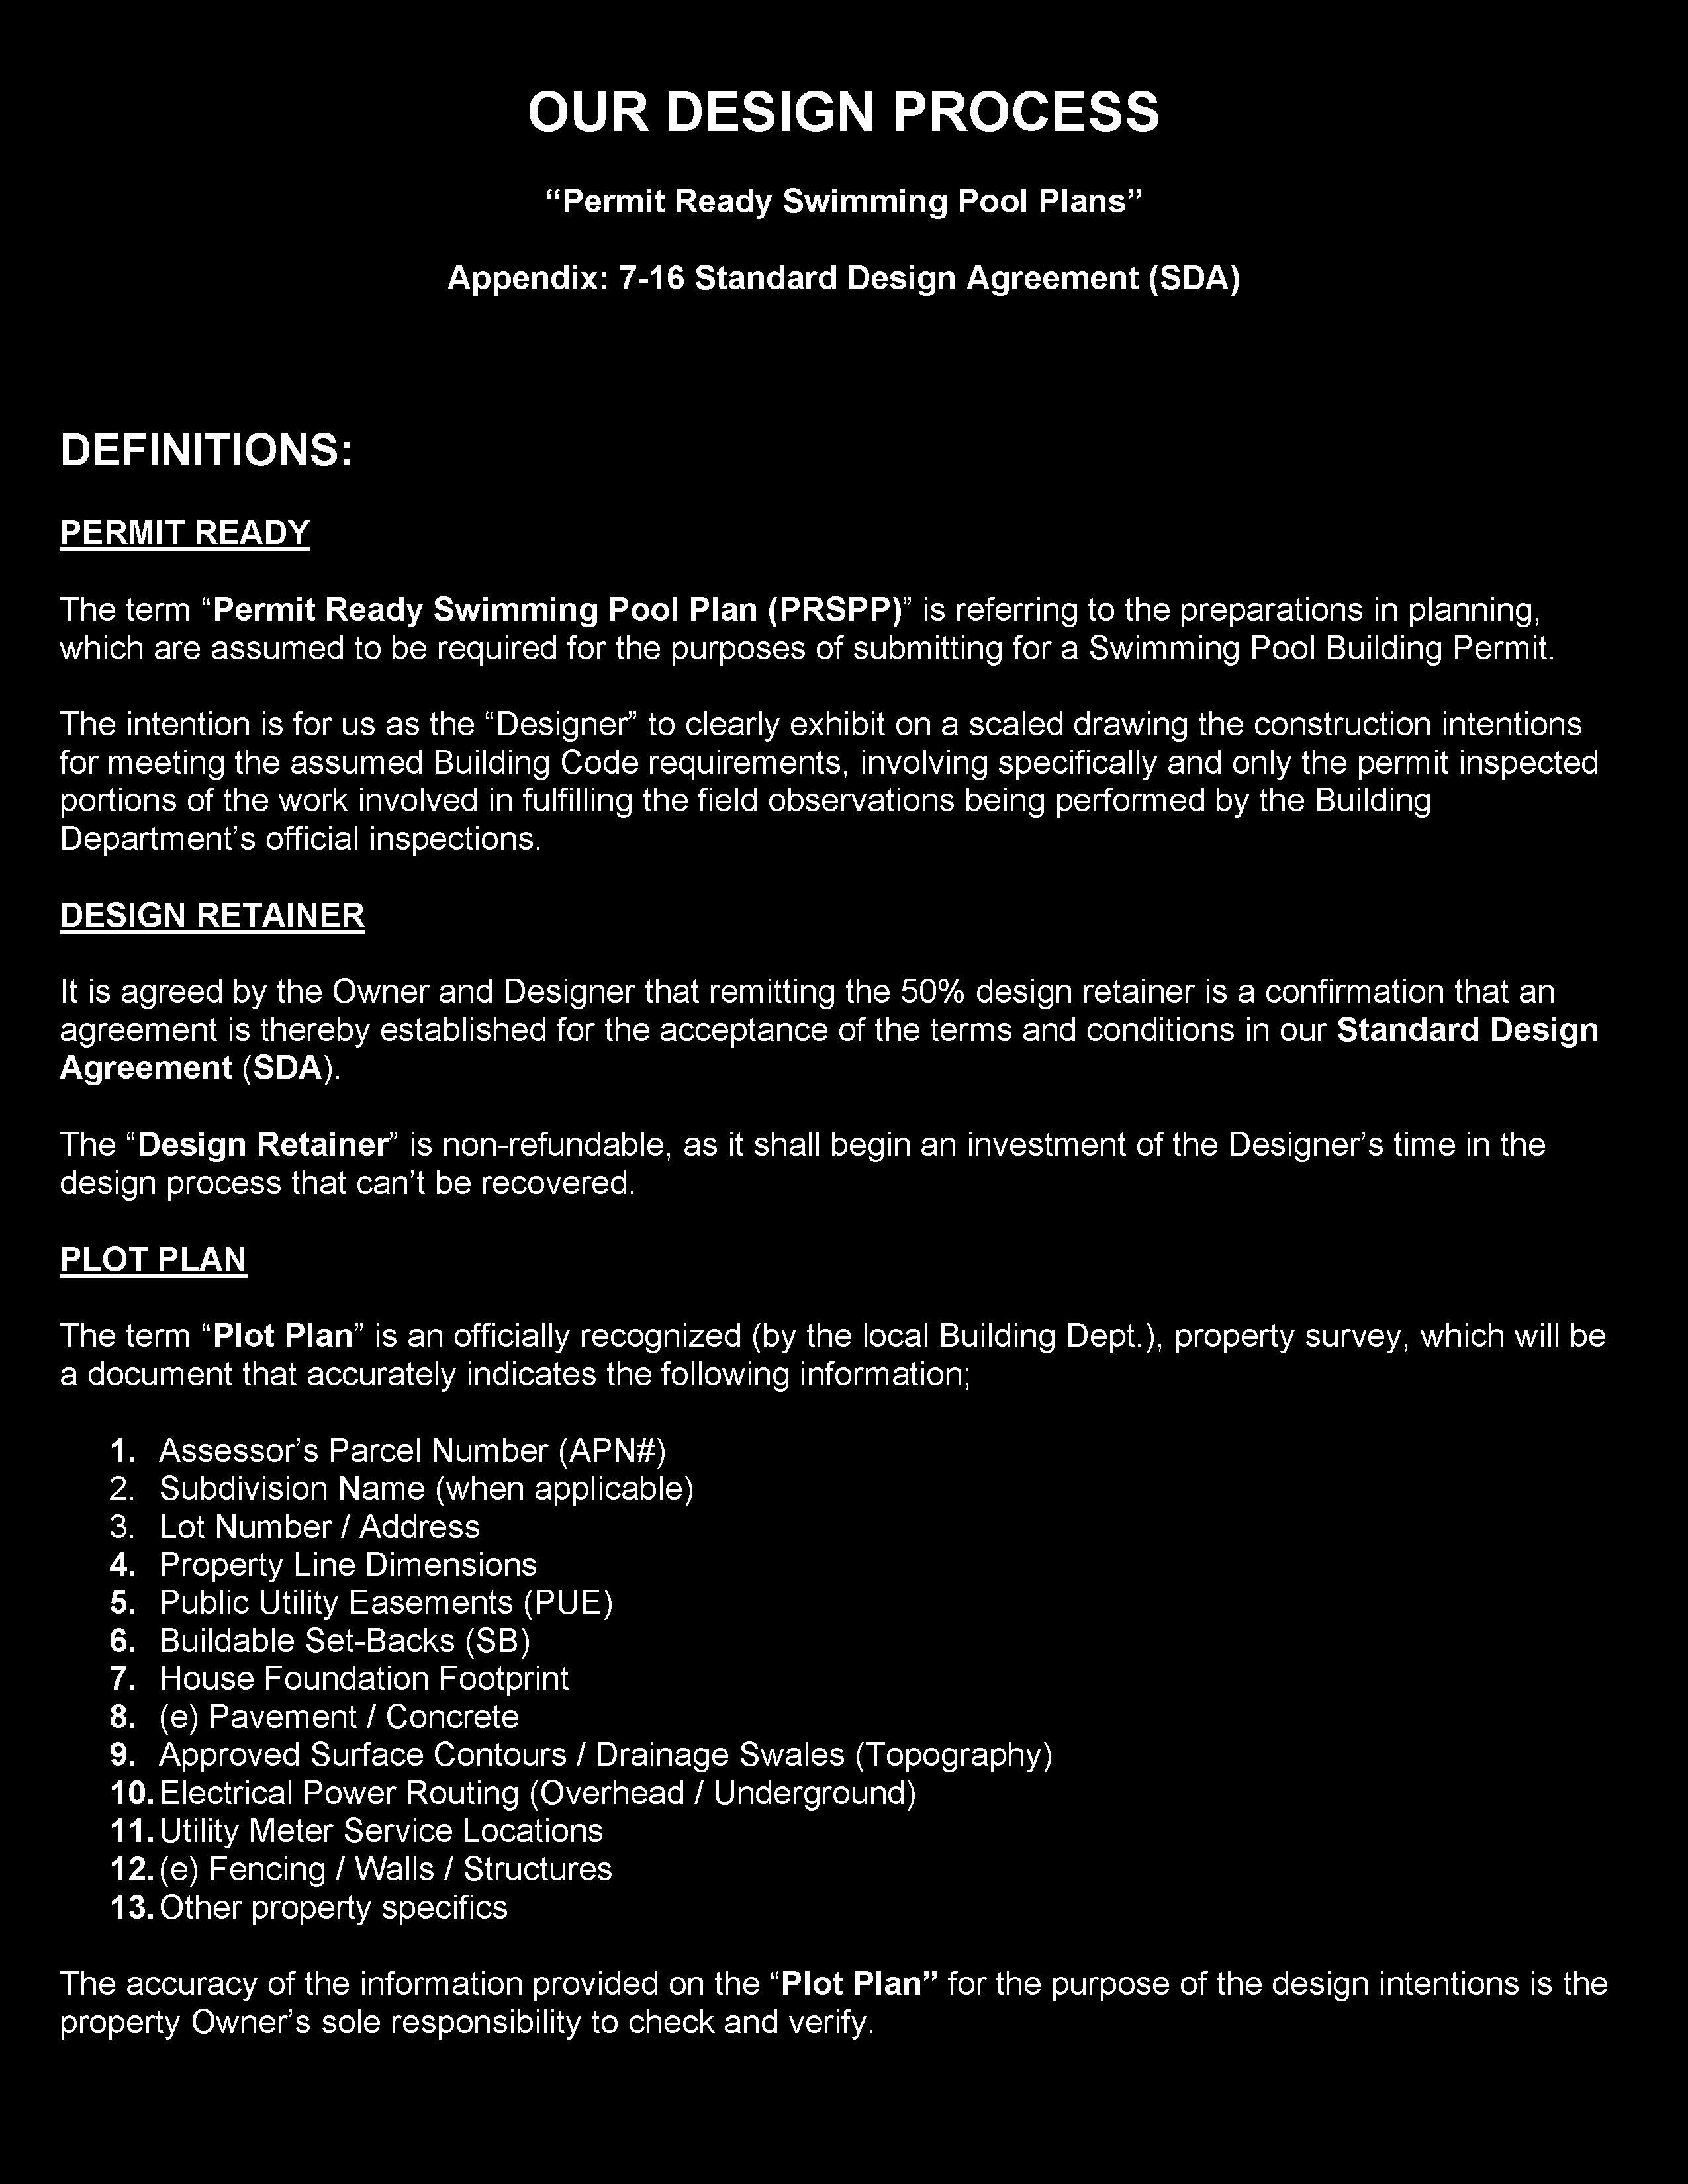 Standard Design Agreement